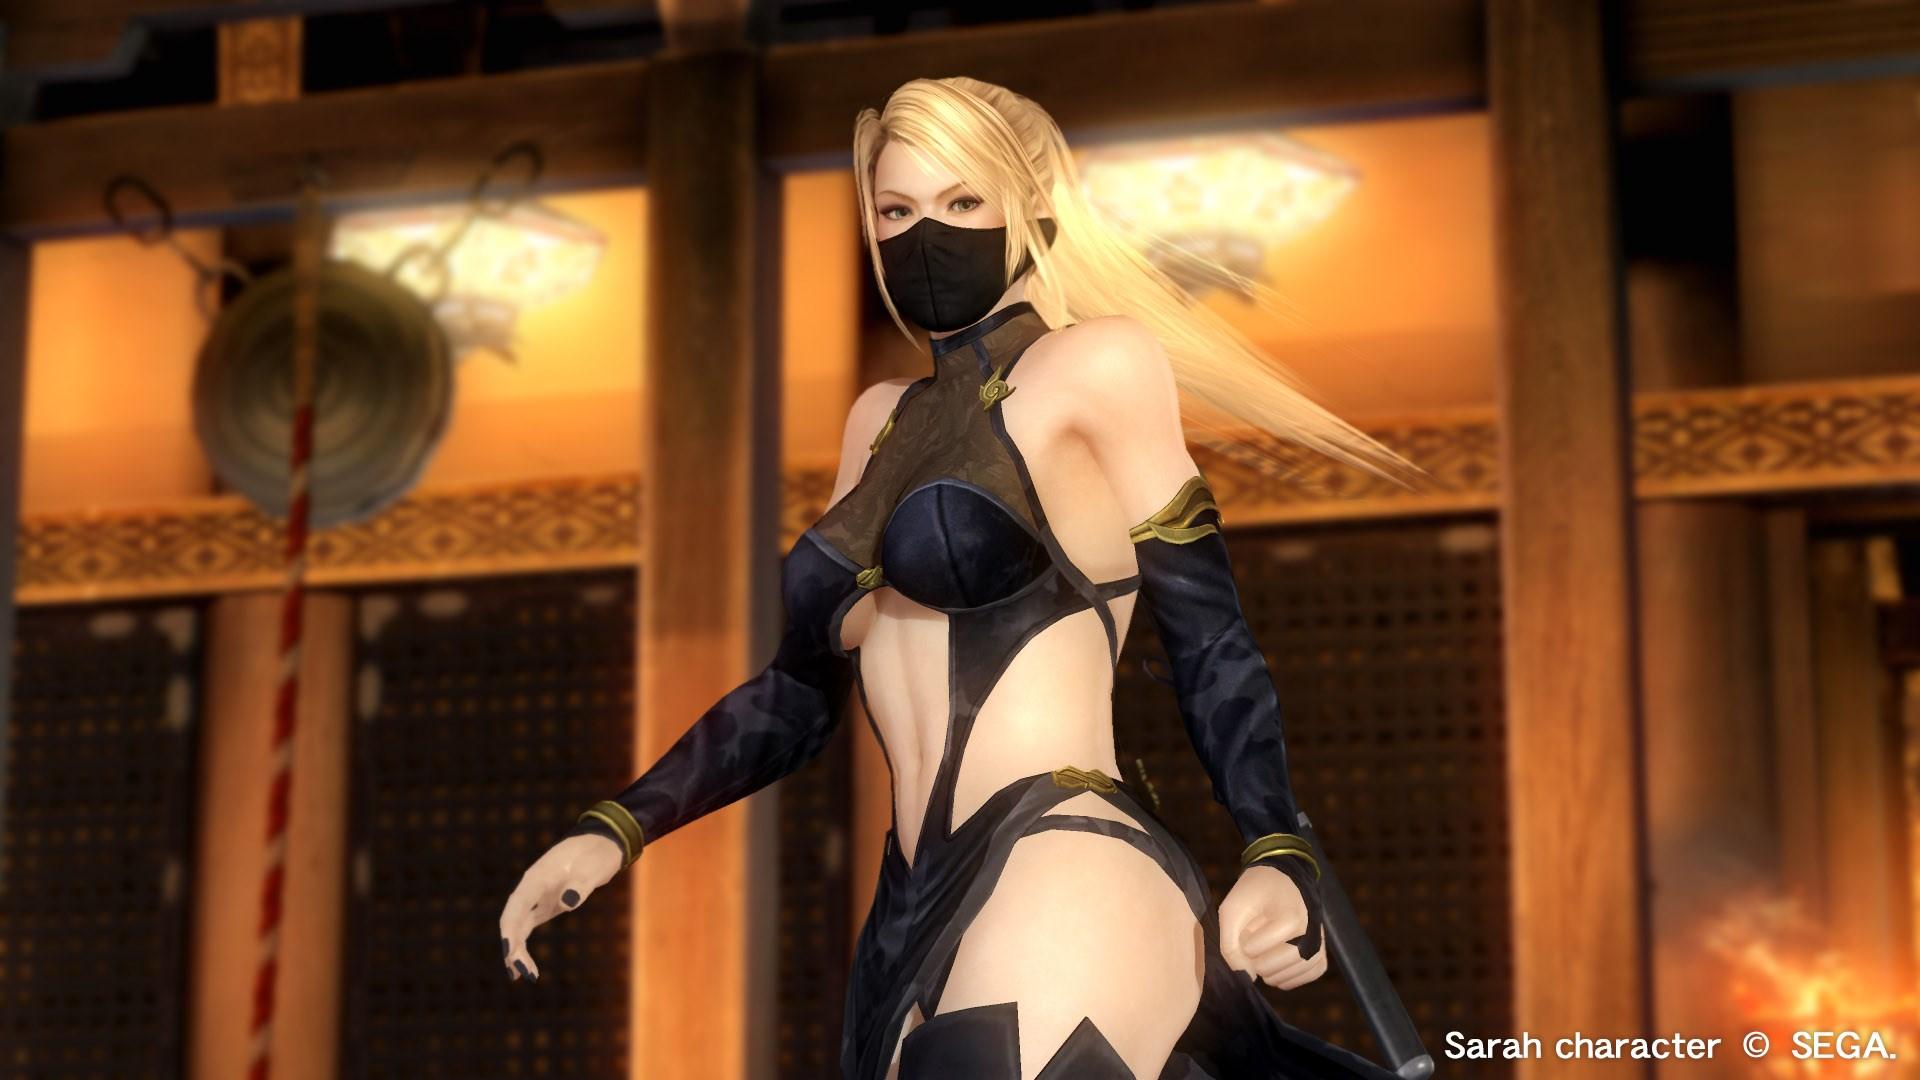 DOA5LR: Clã Ninja 3 - Sarah